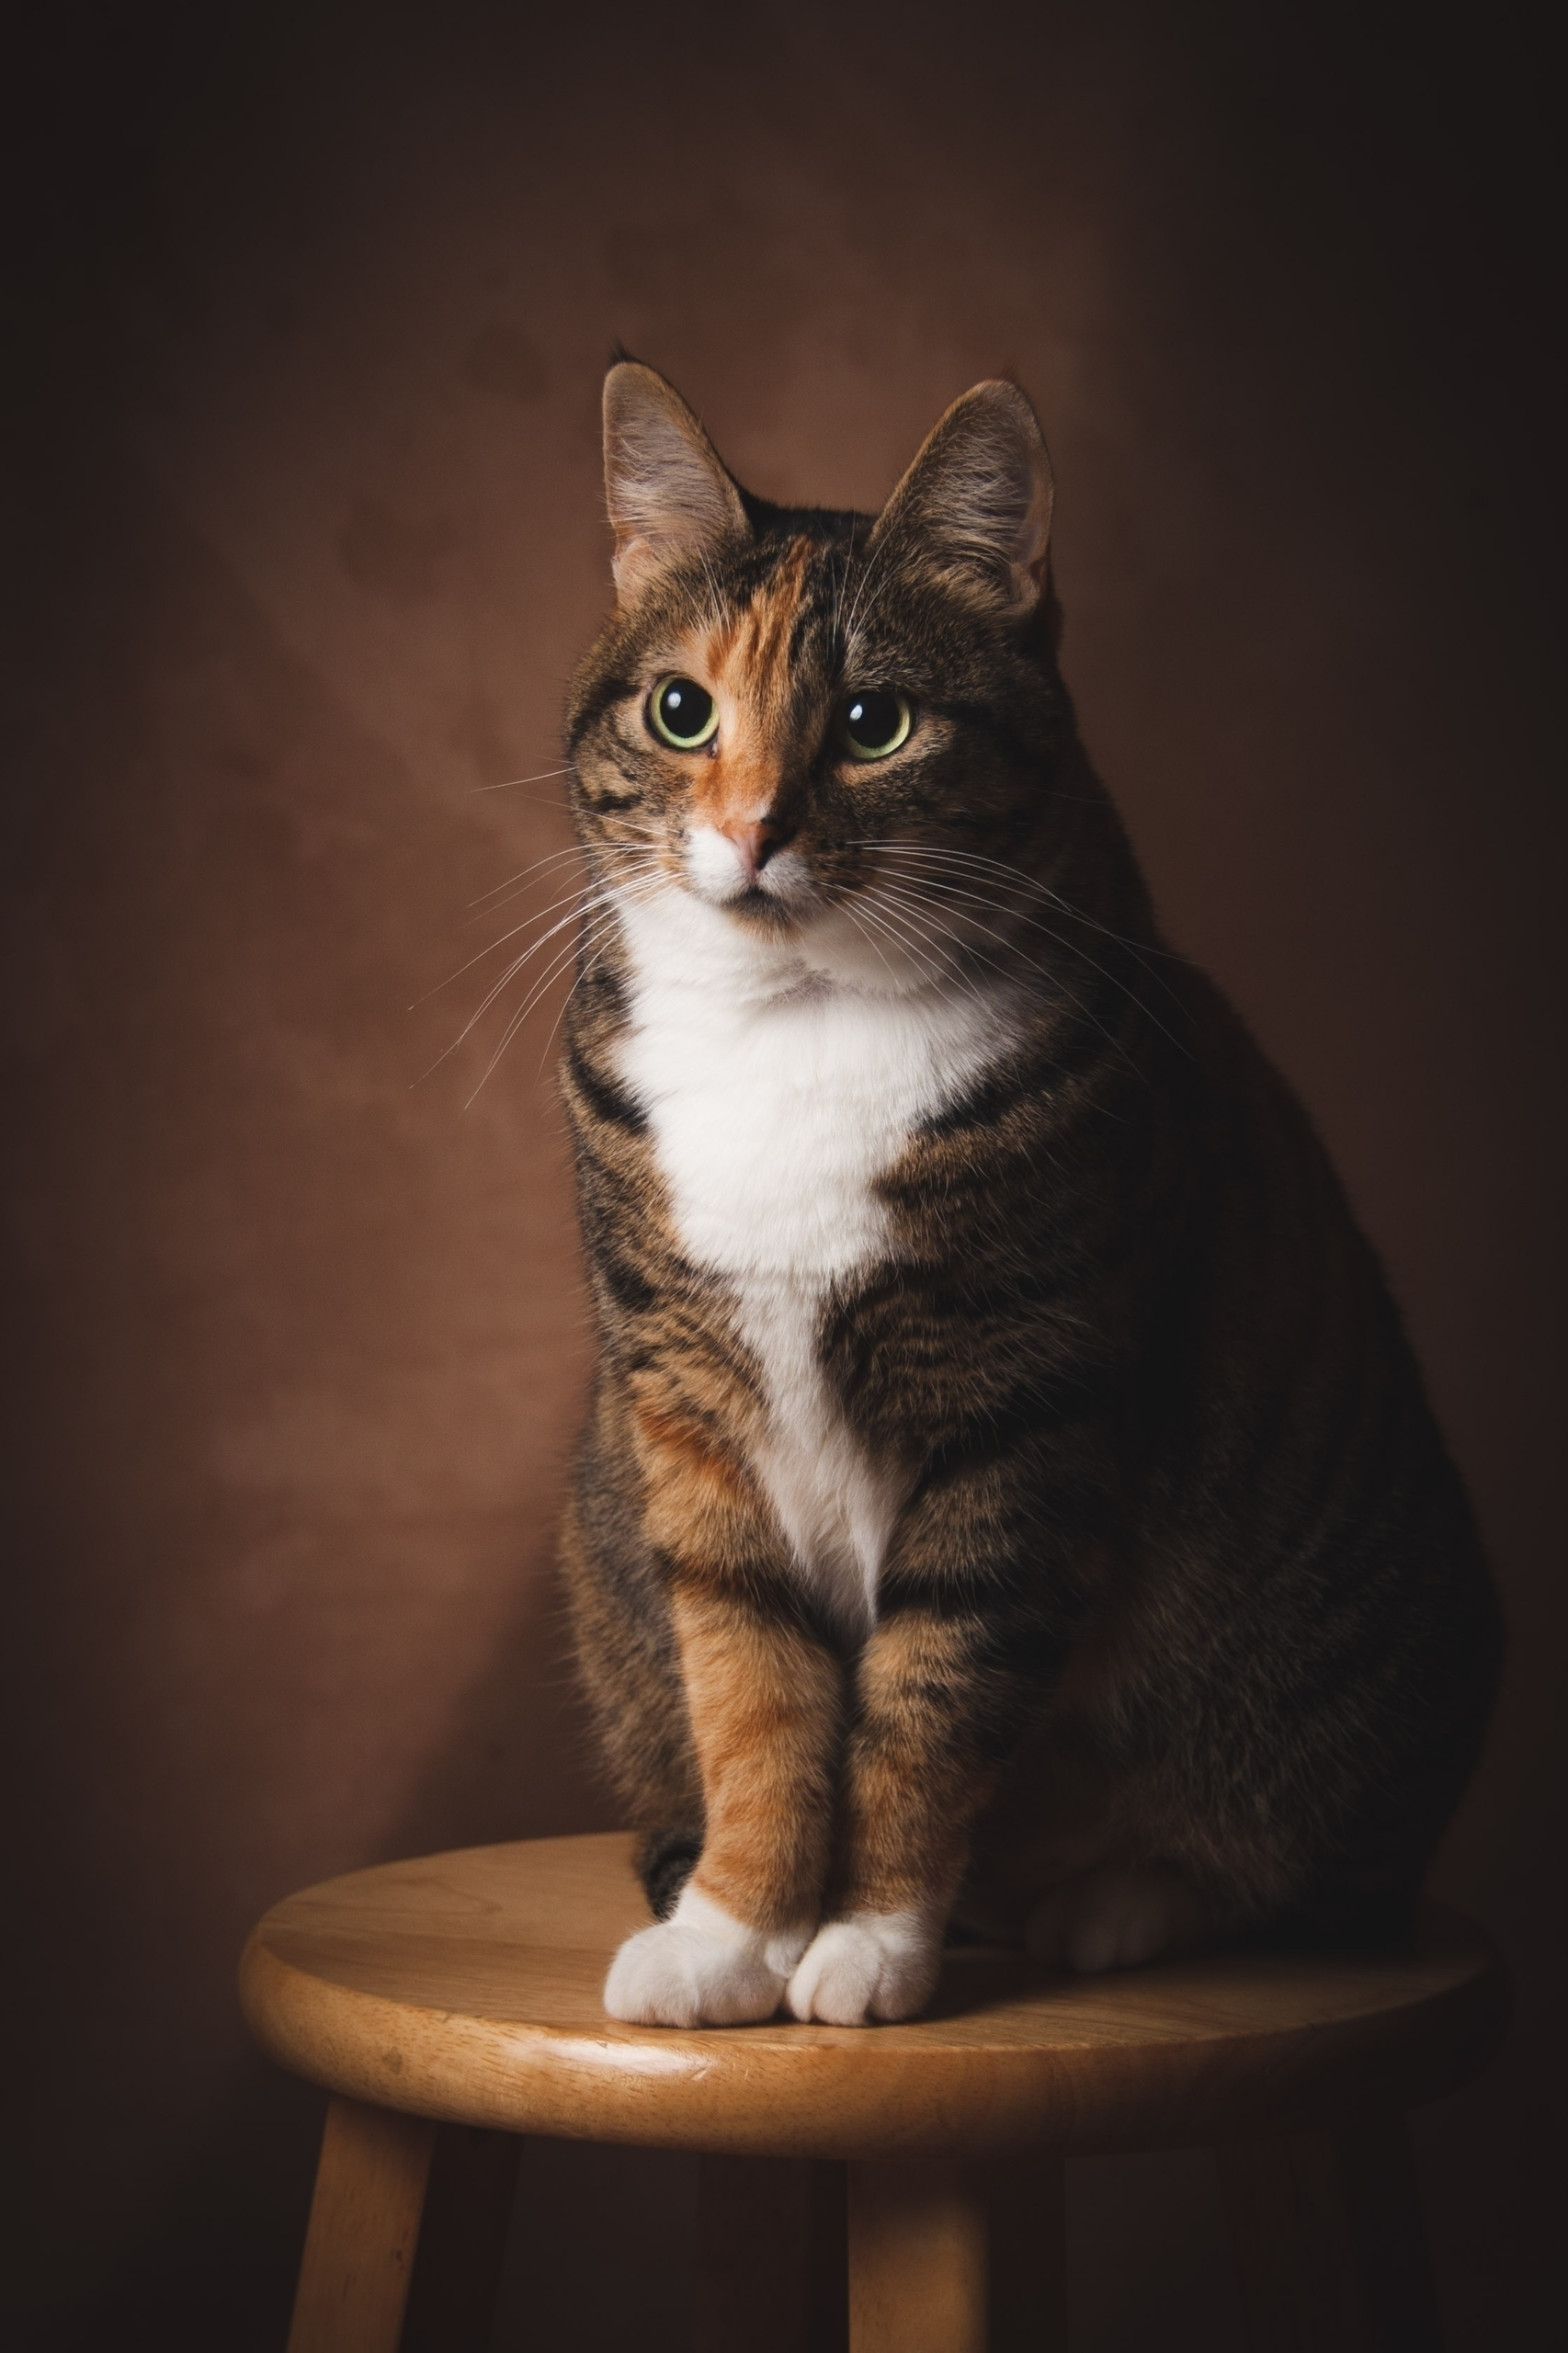 Senior Photo Class '89 - carlamills | ello